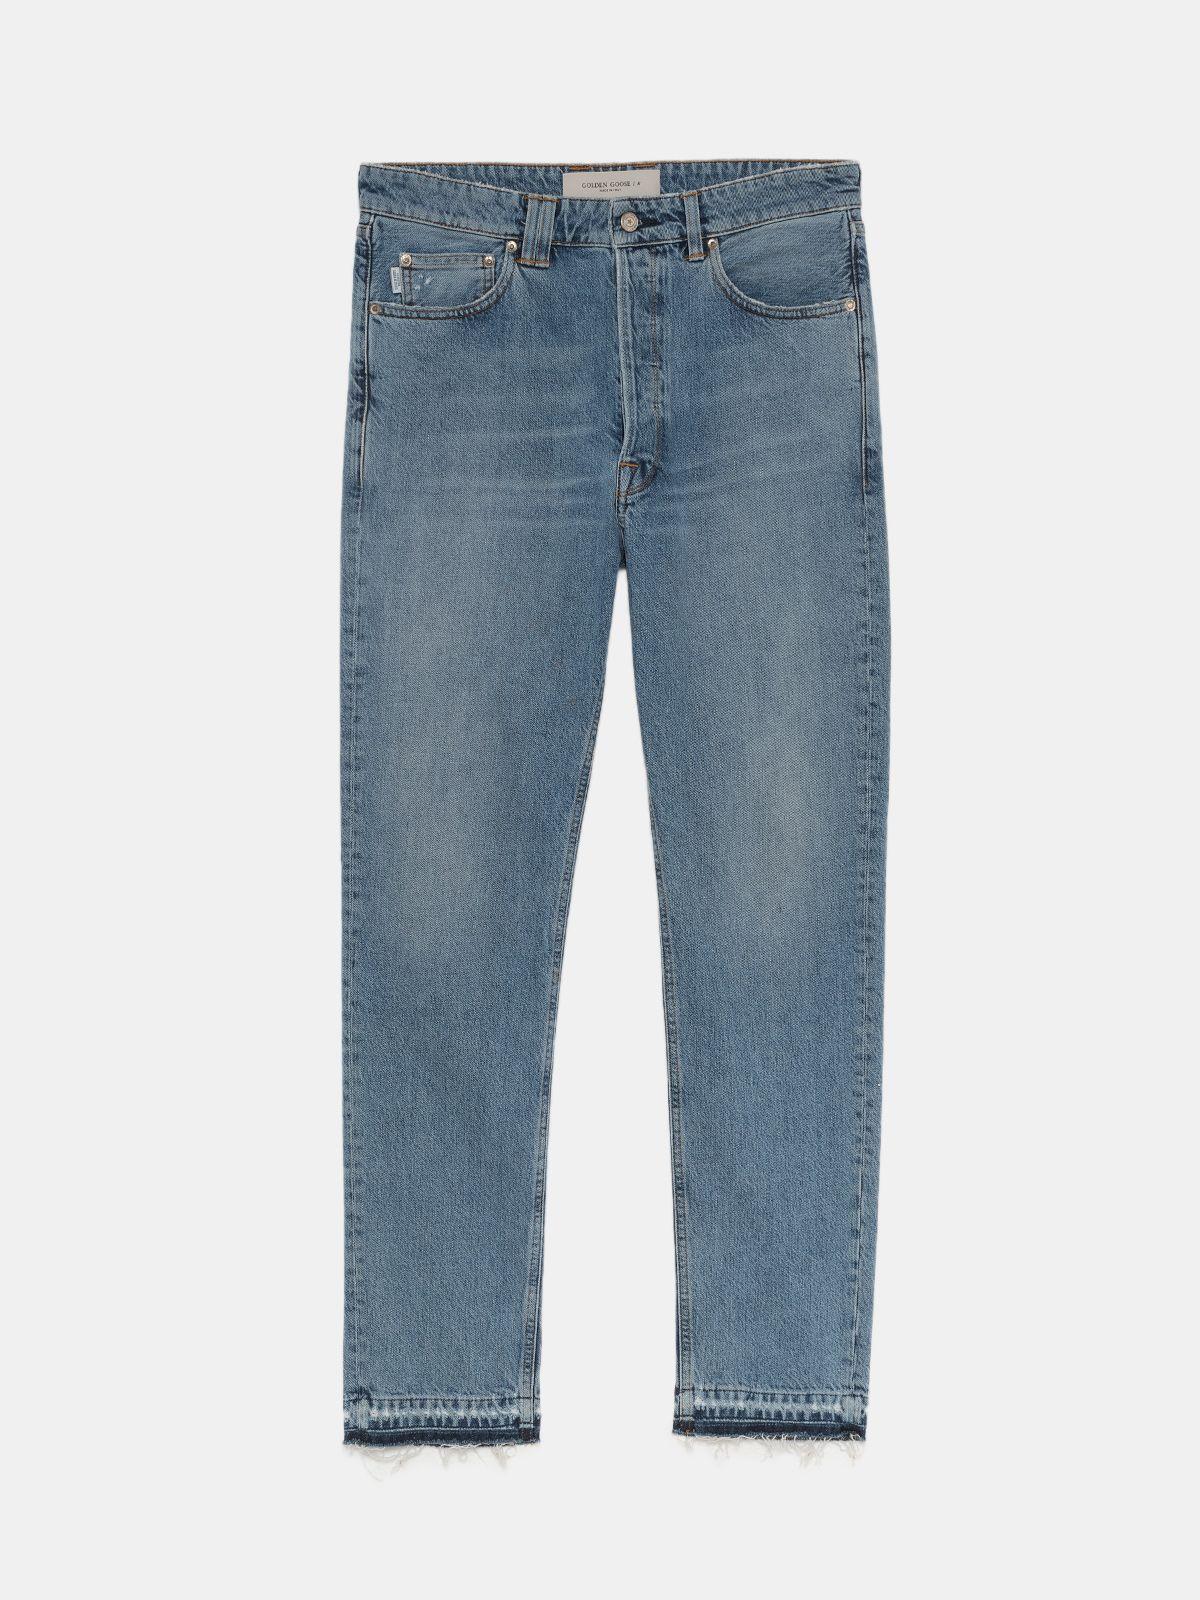 Golden Goose - Jeans Happy in denim light blue in